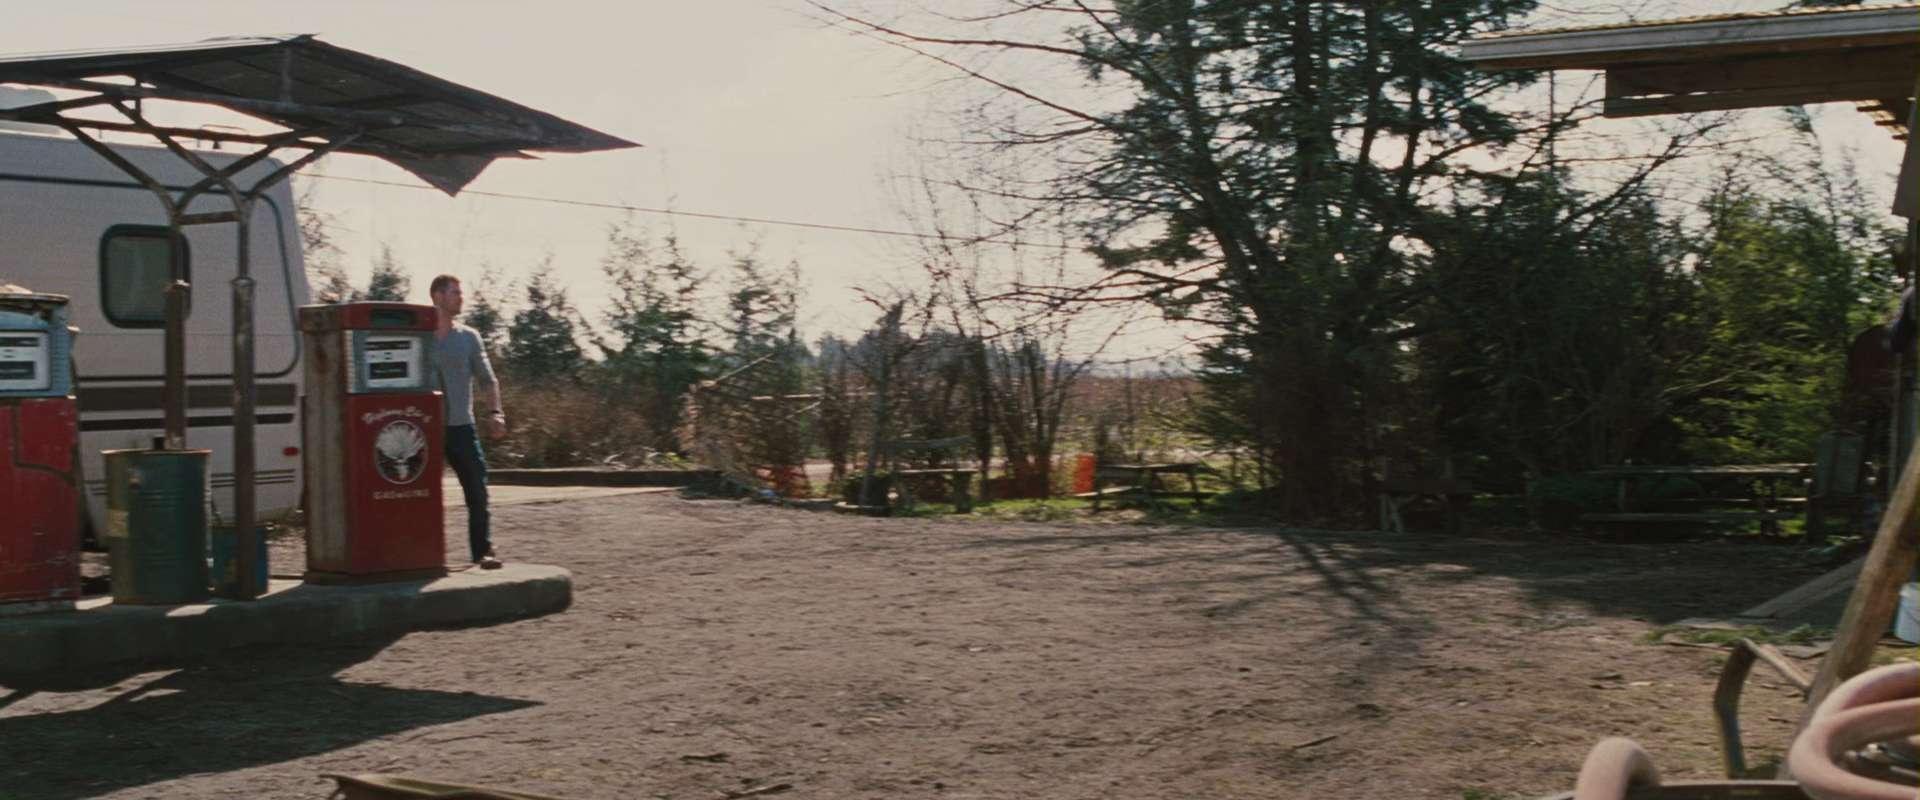 The Cabin in the Woods 2012 1080p 10bit BluRay 5 1 x265 HEVC-MZABI